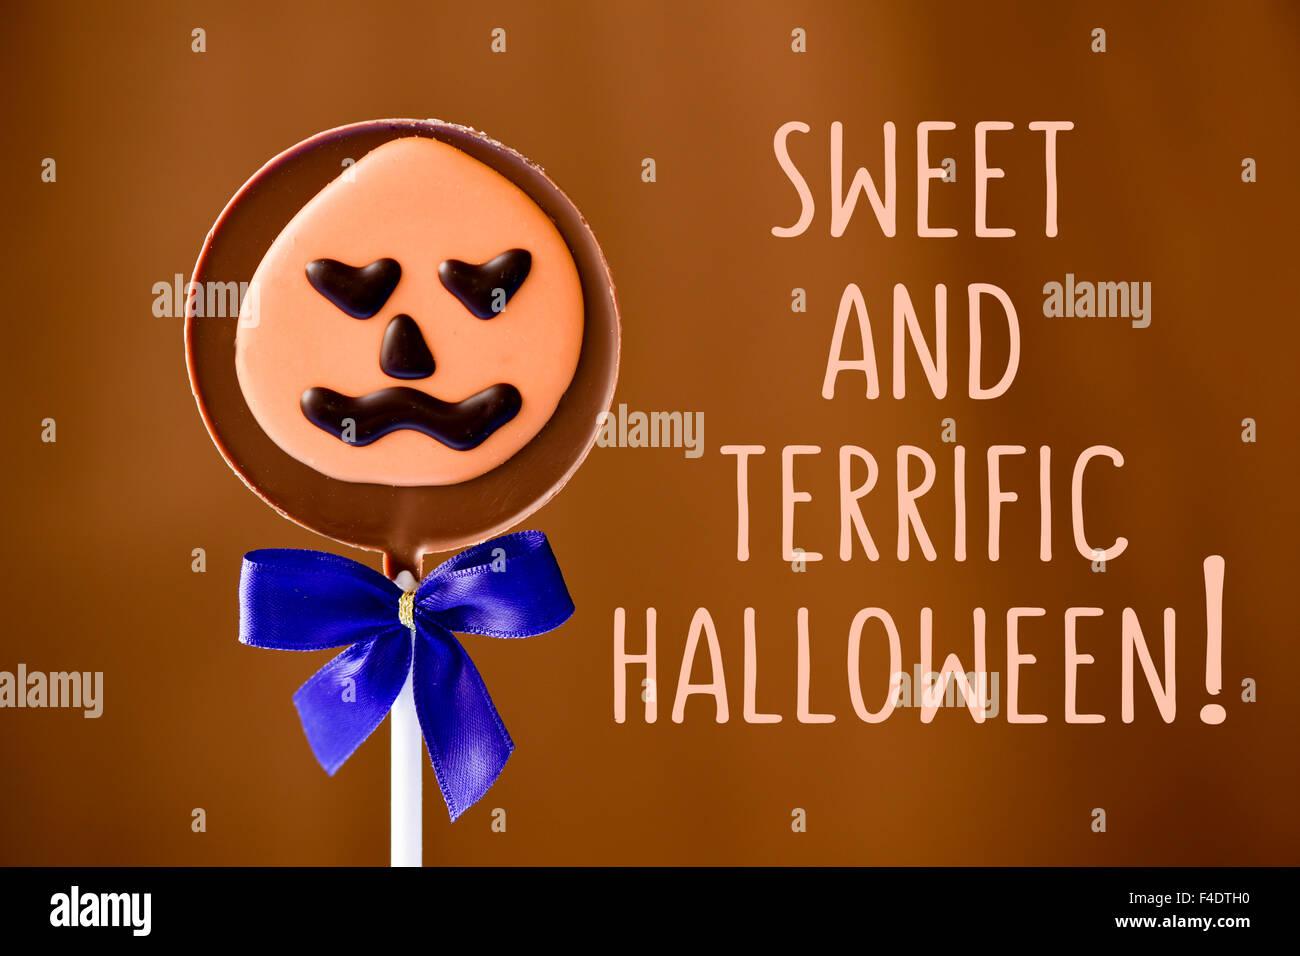 Halloween character message sign pumpkin stock photos halloween a pumpkin shaped chocolate lollipop and the text sweet and terrific halloween against a brown m4hsunfo